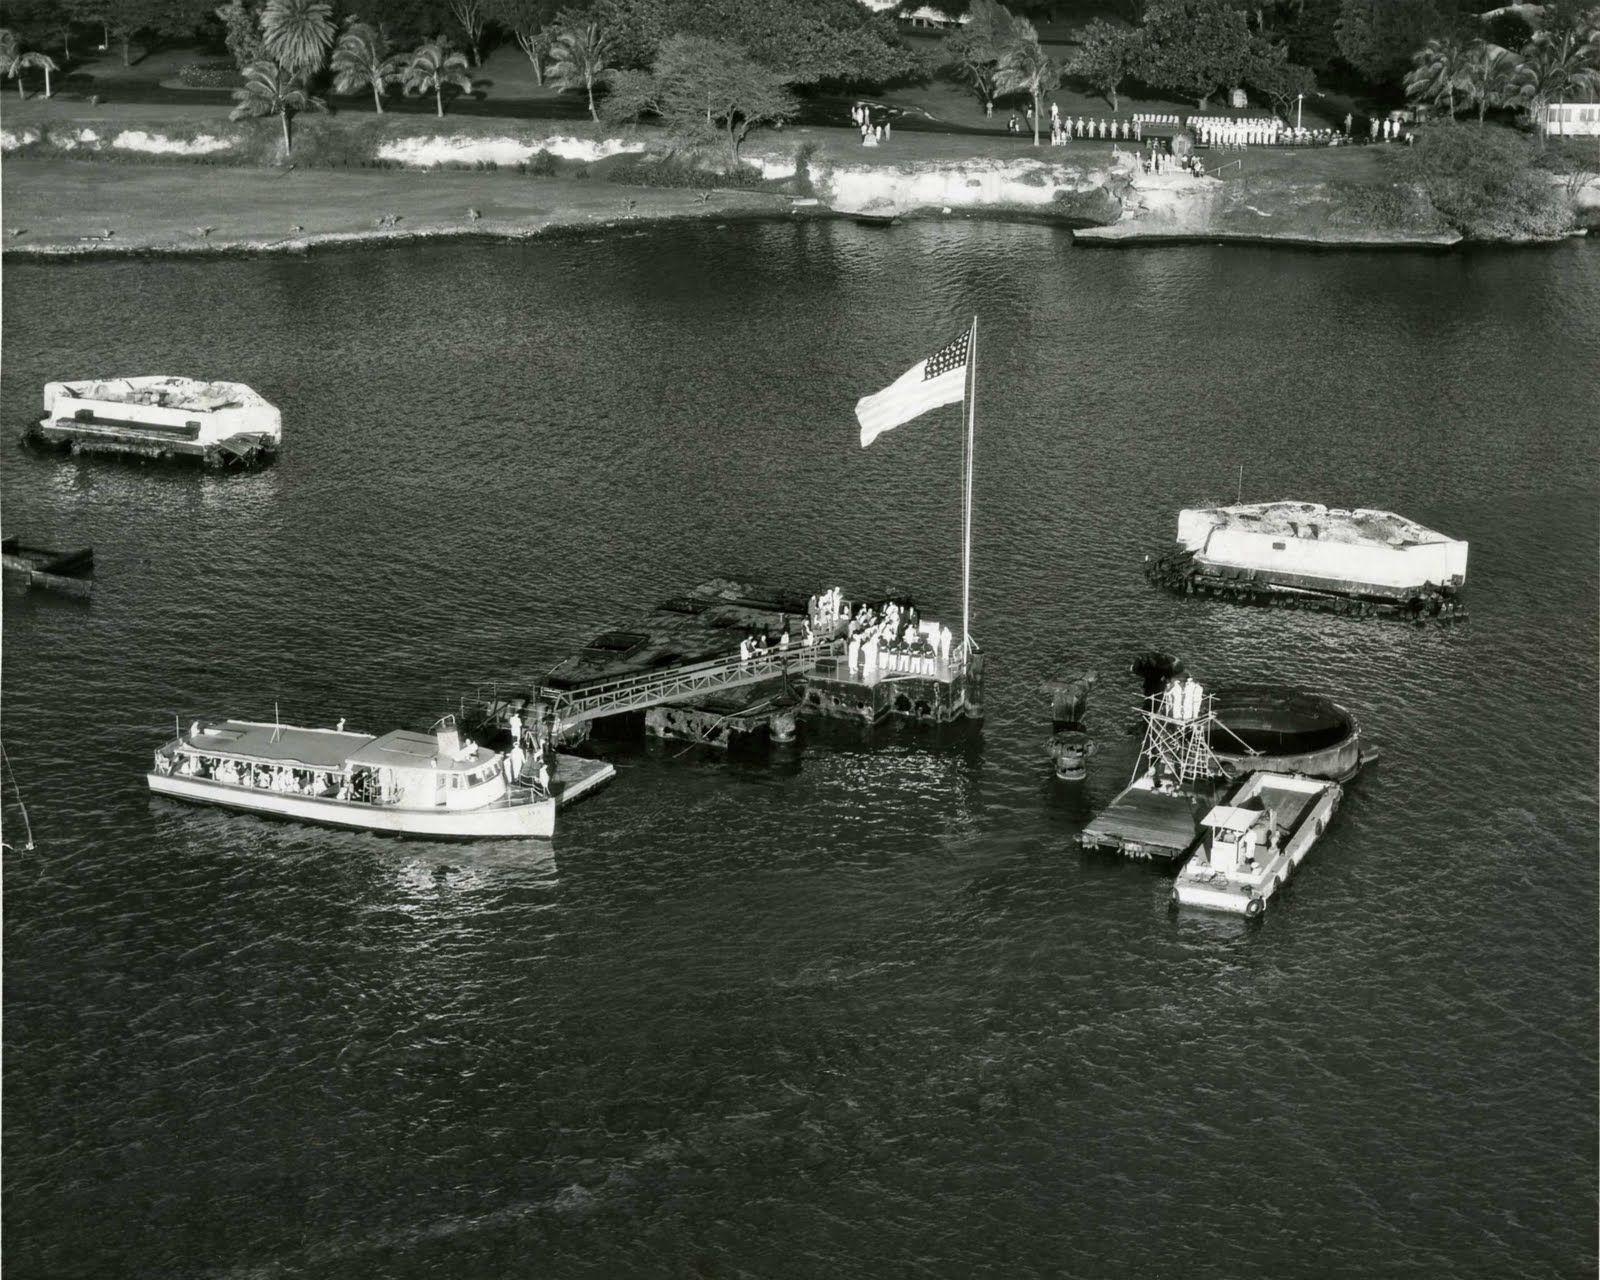 1957Dec7 Where the USS Arizona Memorial will be